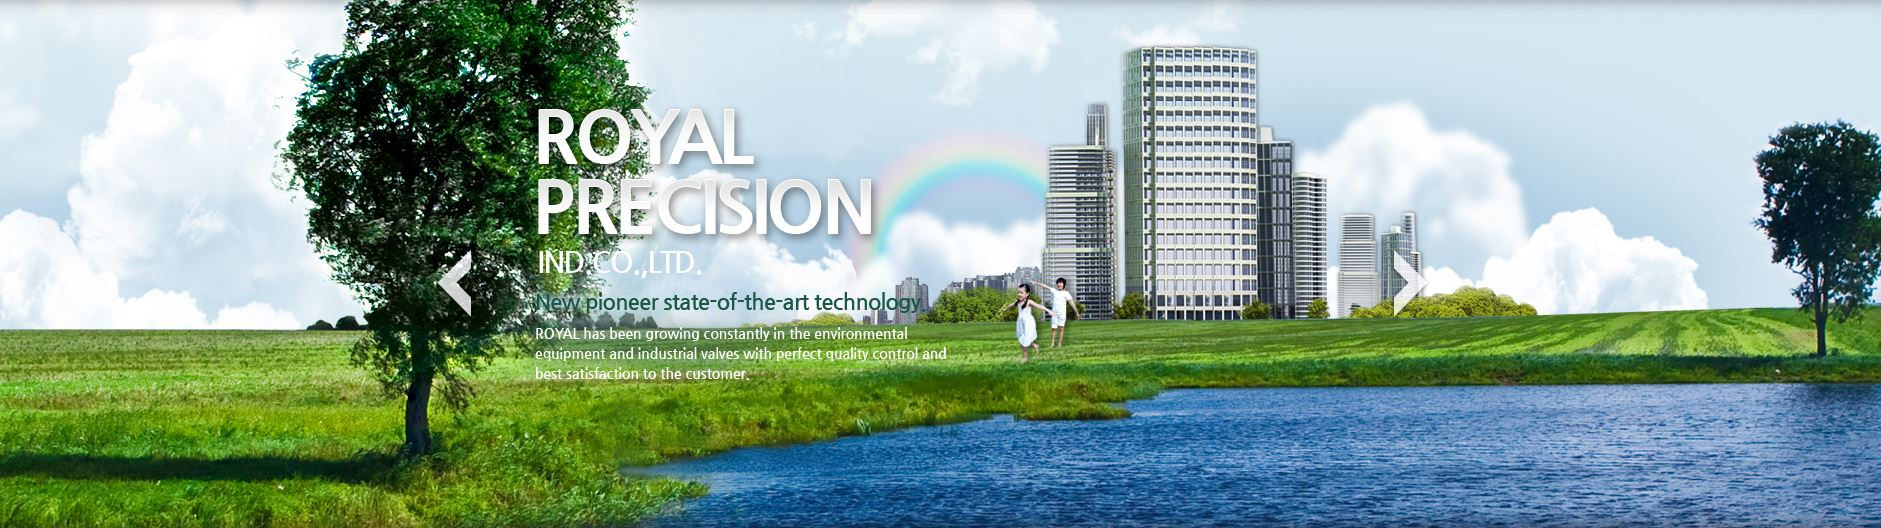 ROYAL PRECISION IND.CO.LTD Main Image